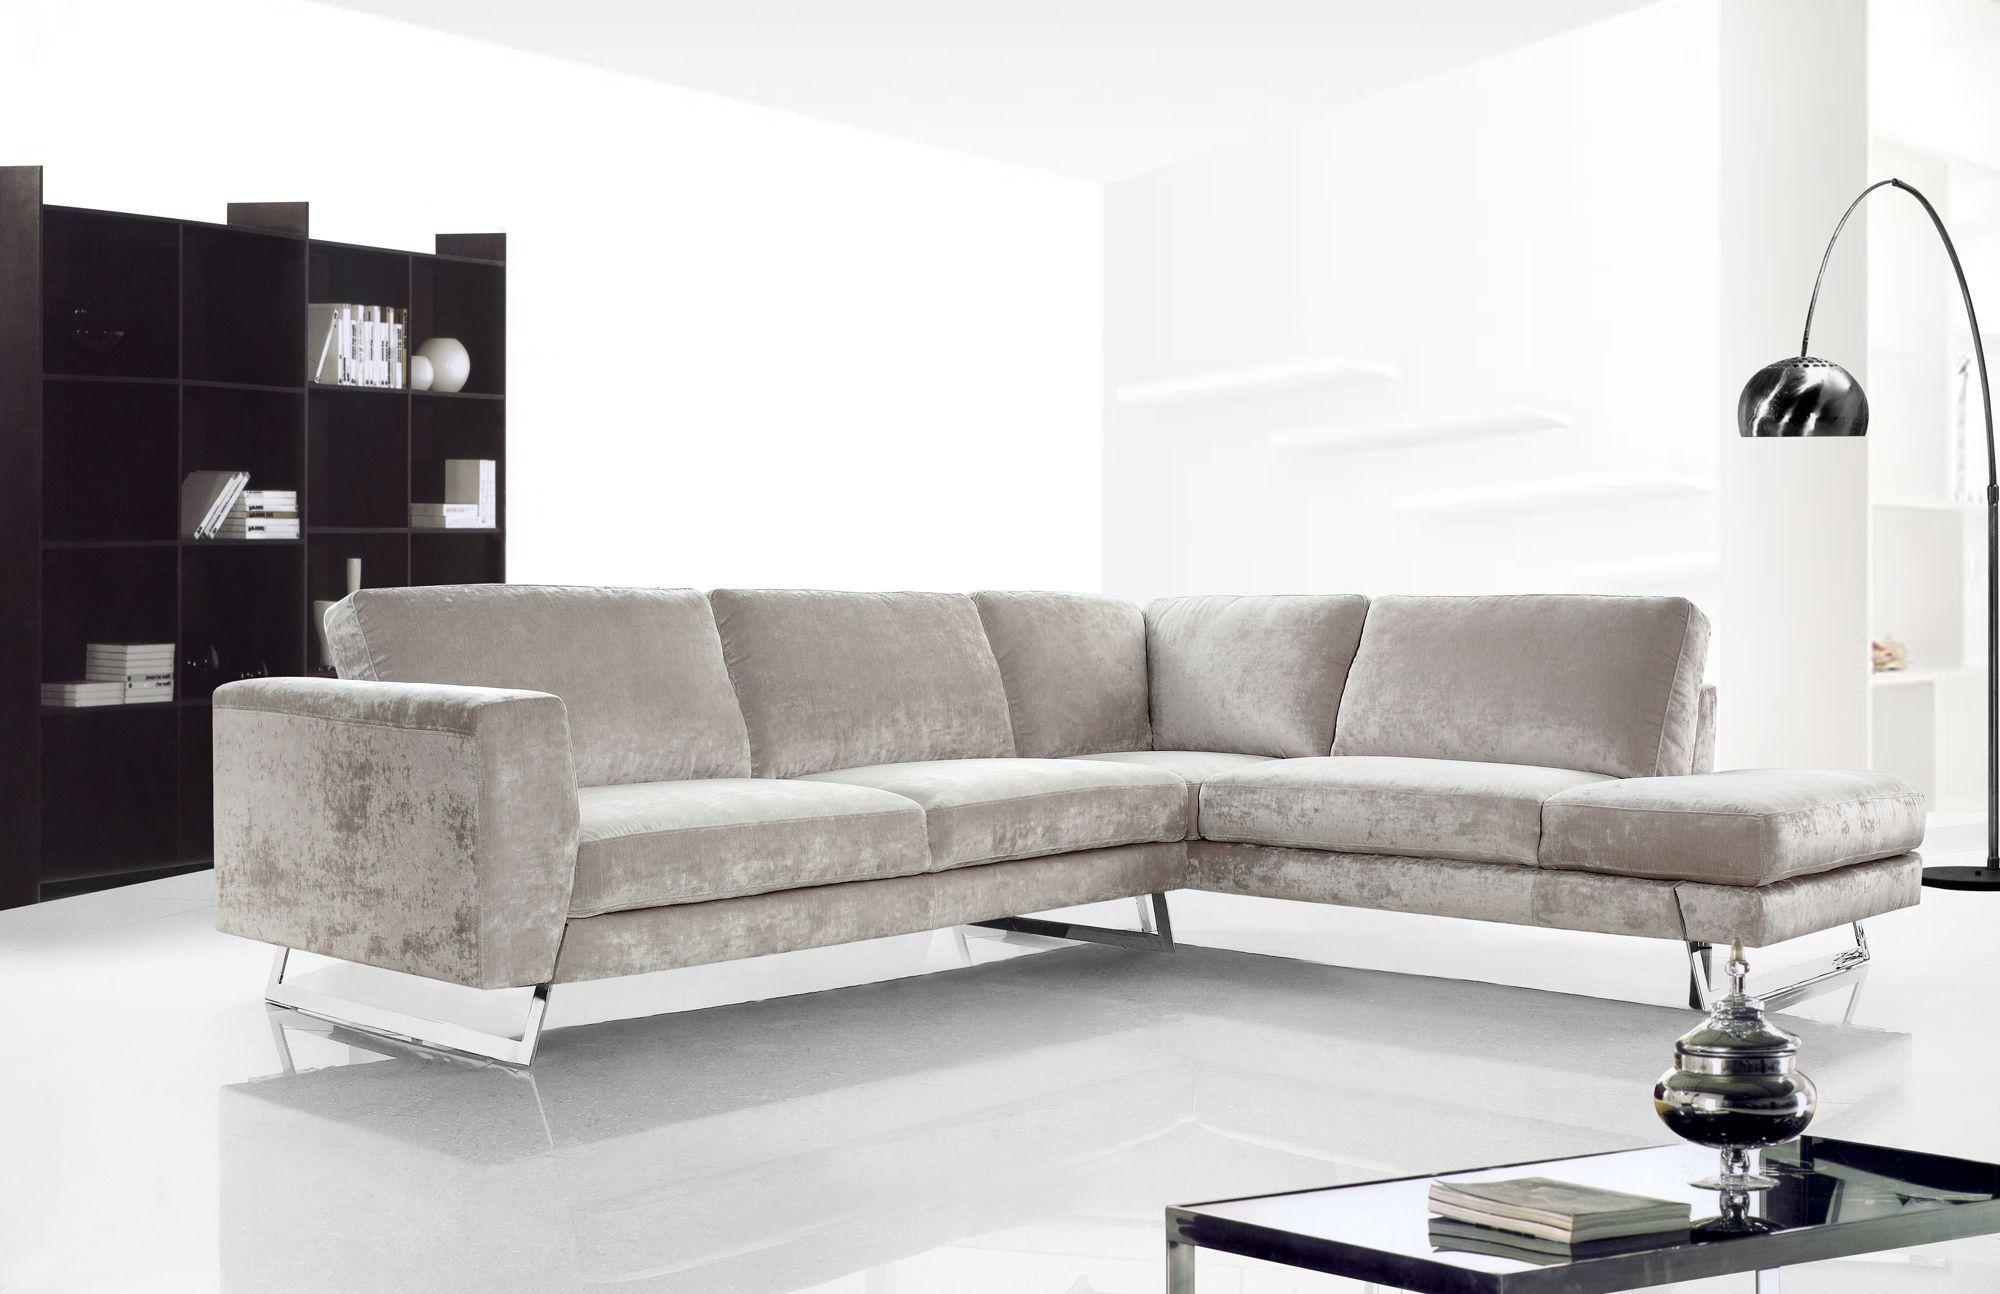 comfy sofas uk sam sofa ulhasnagar east maharashtra vivid modern corner denelli italia